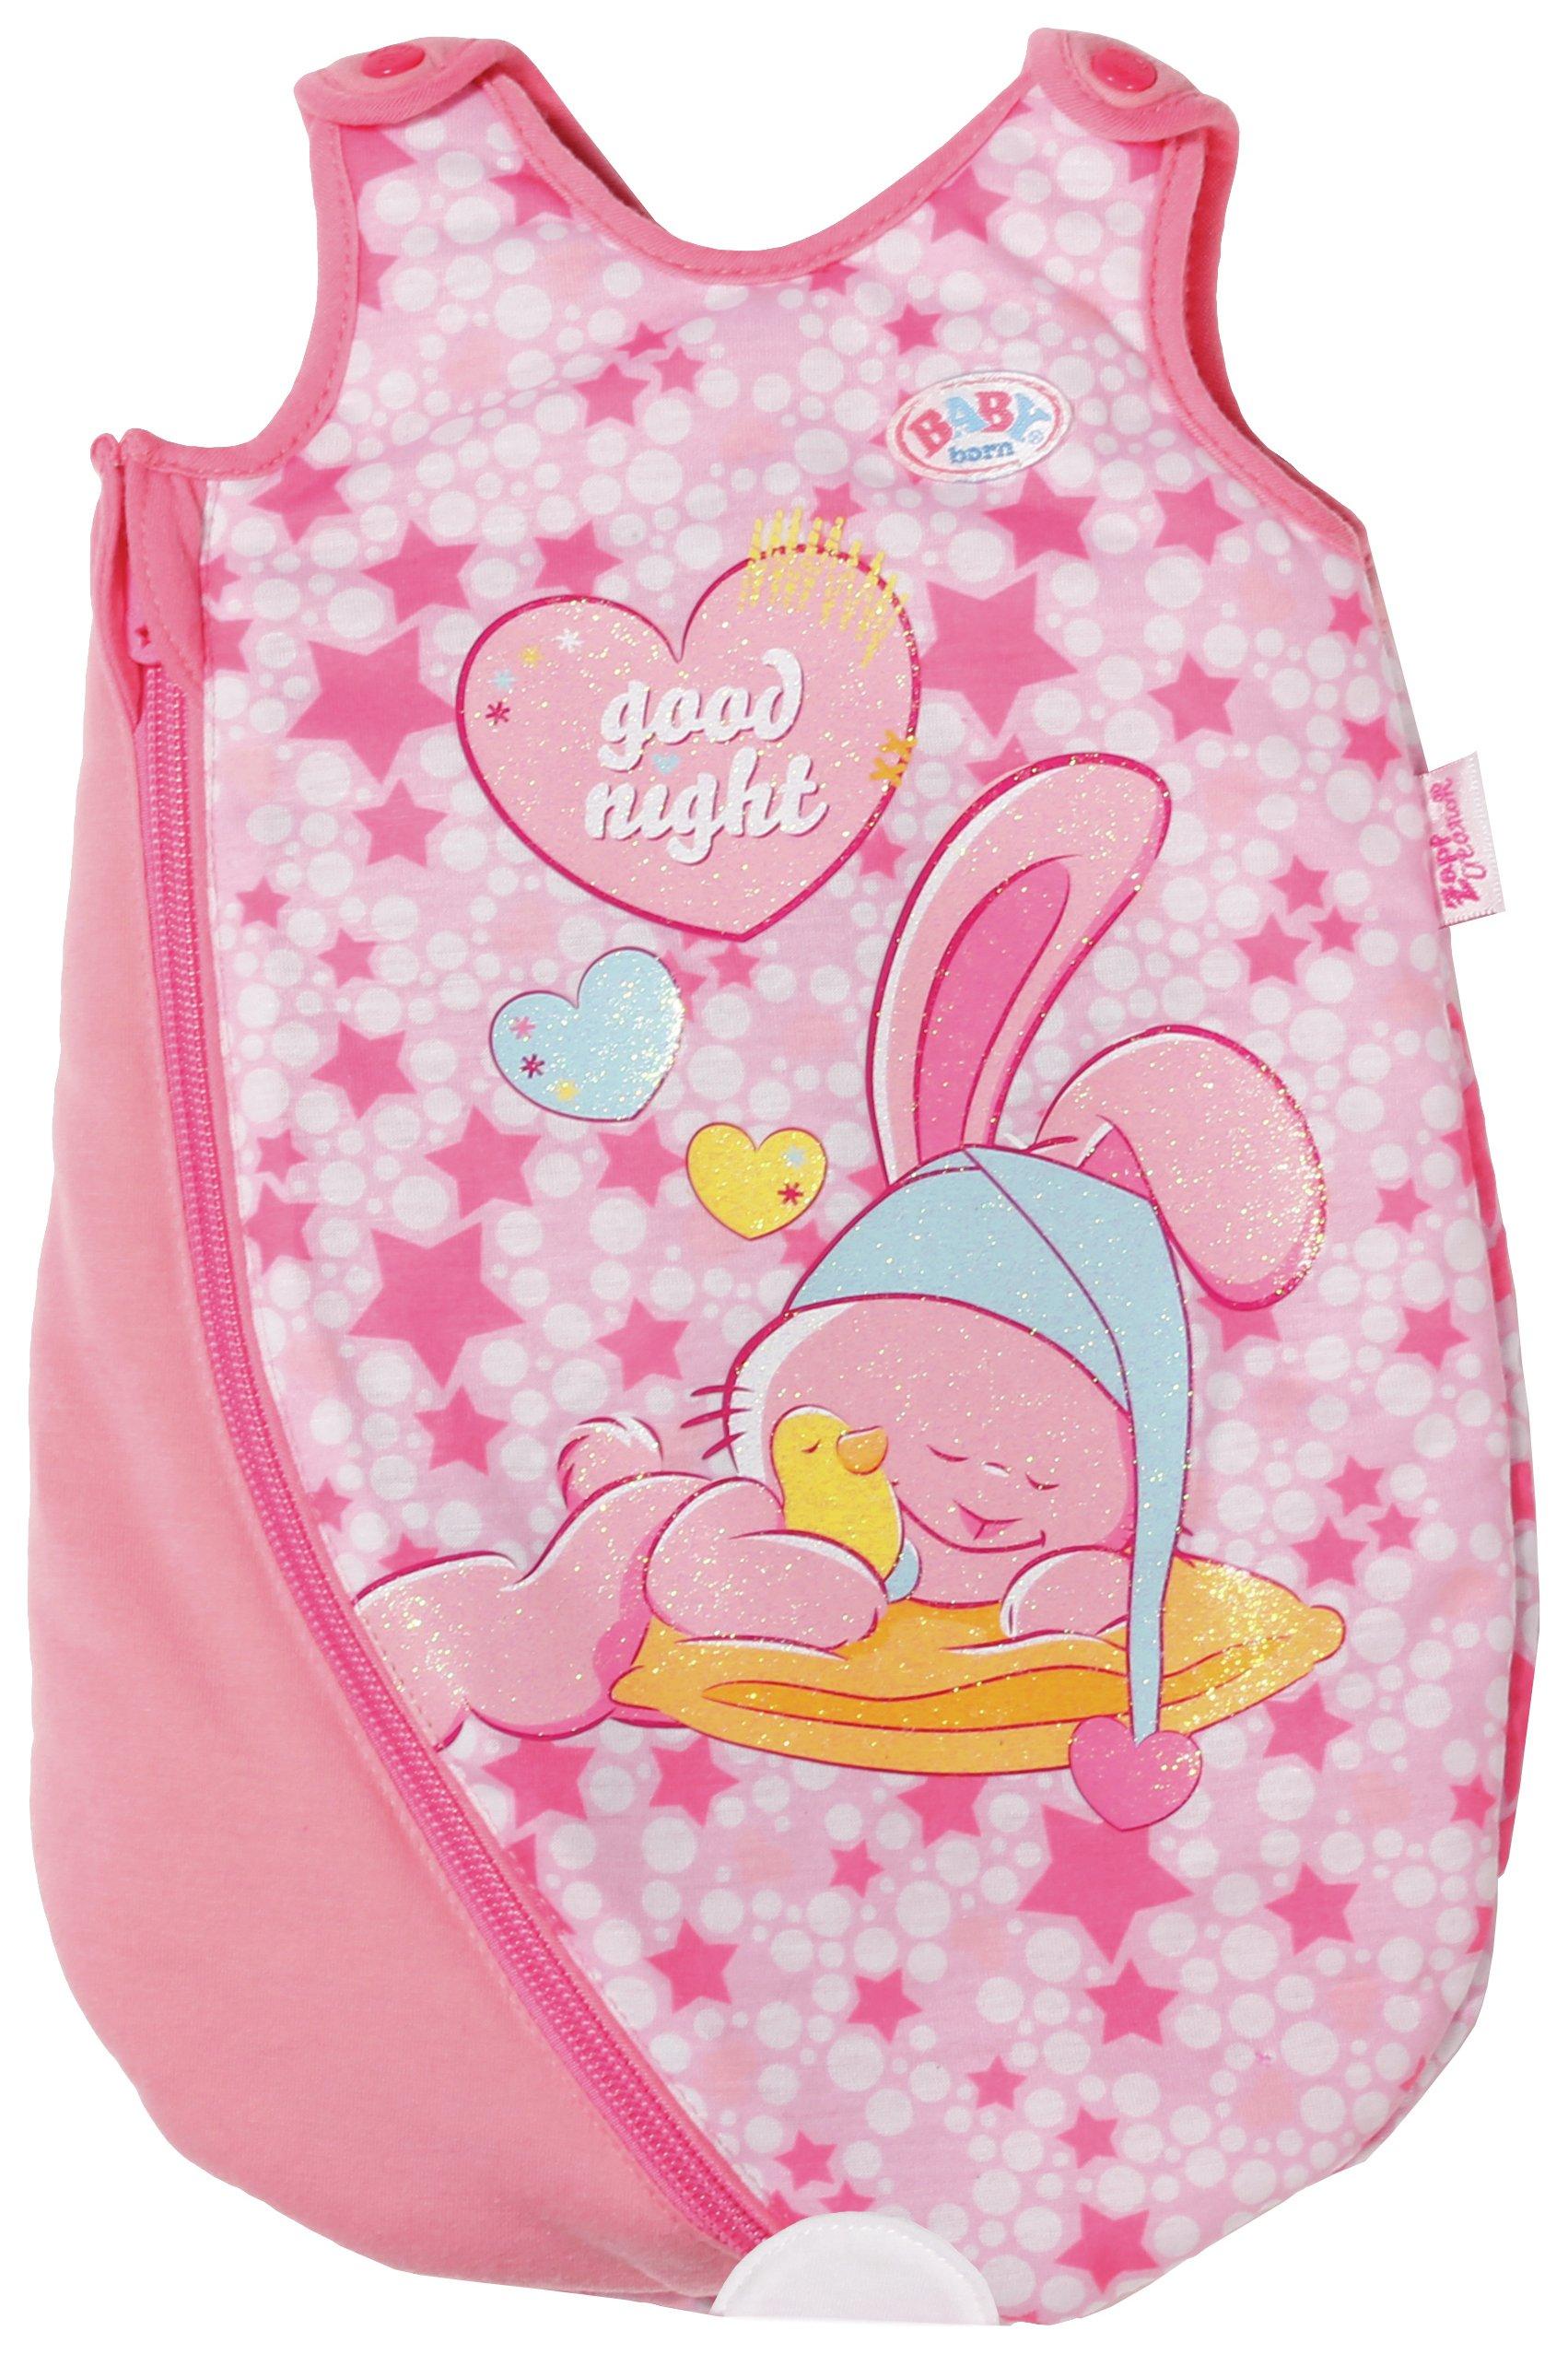 Image of BABY Born Sleeping Bag.